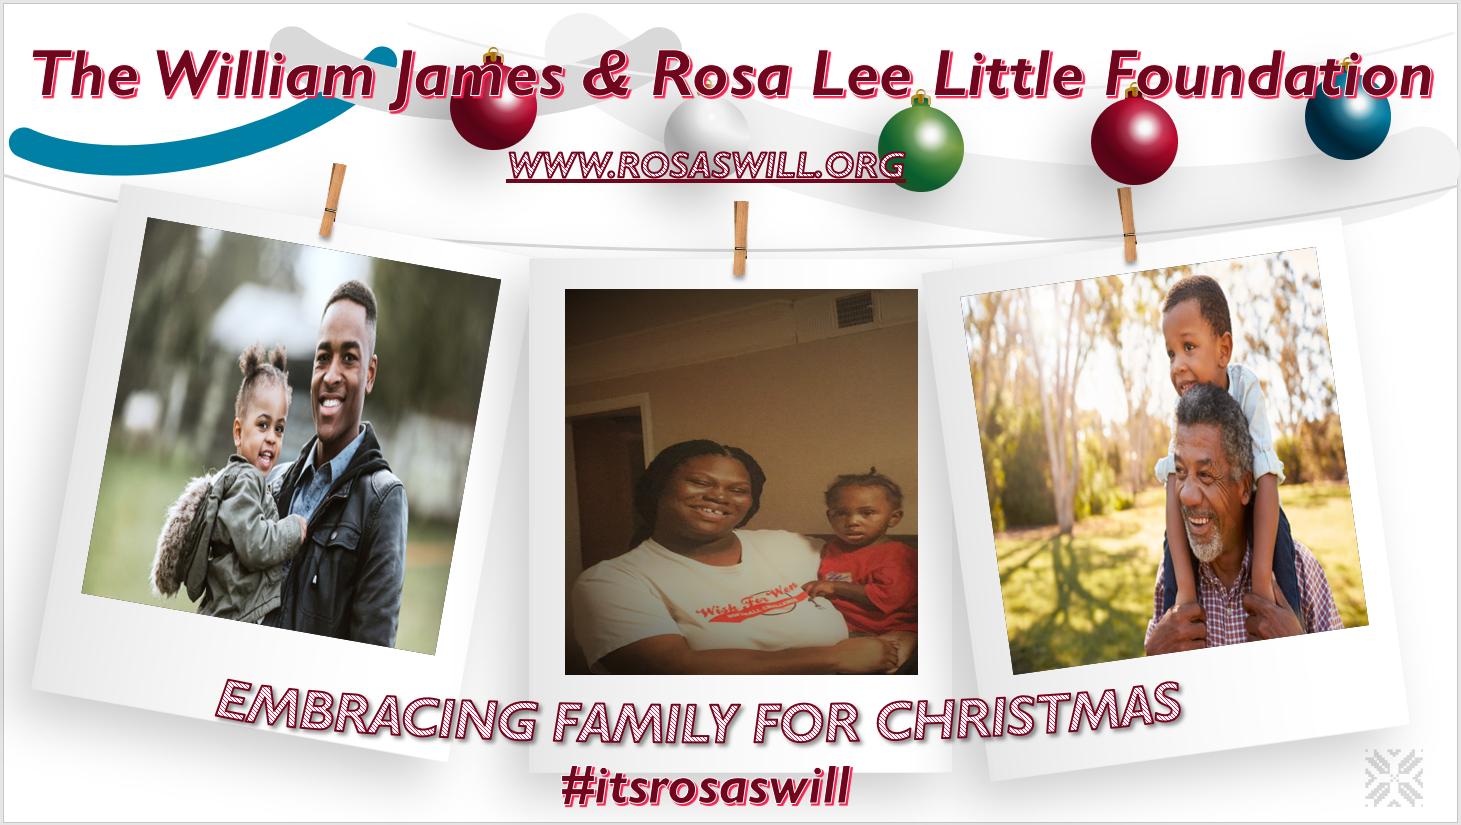 2019 Embracing Family For Christmas